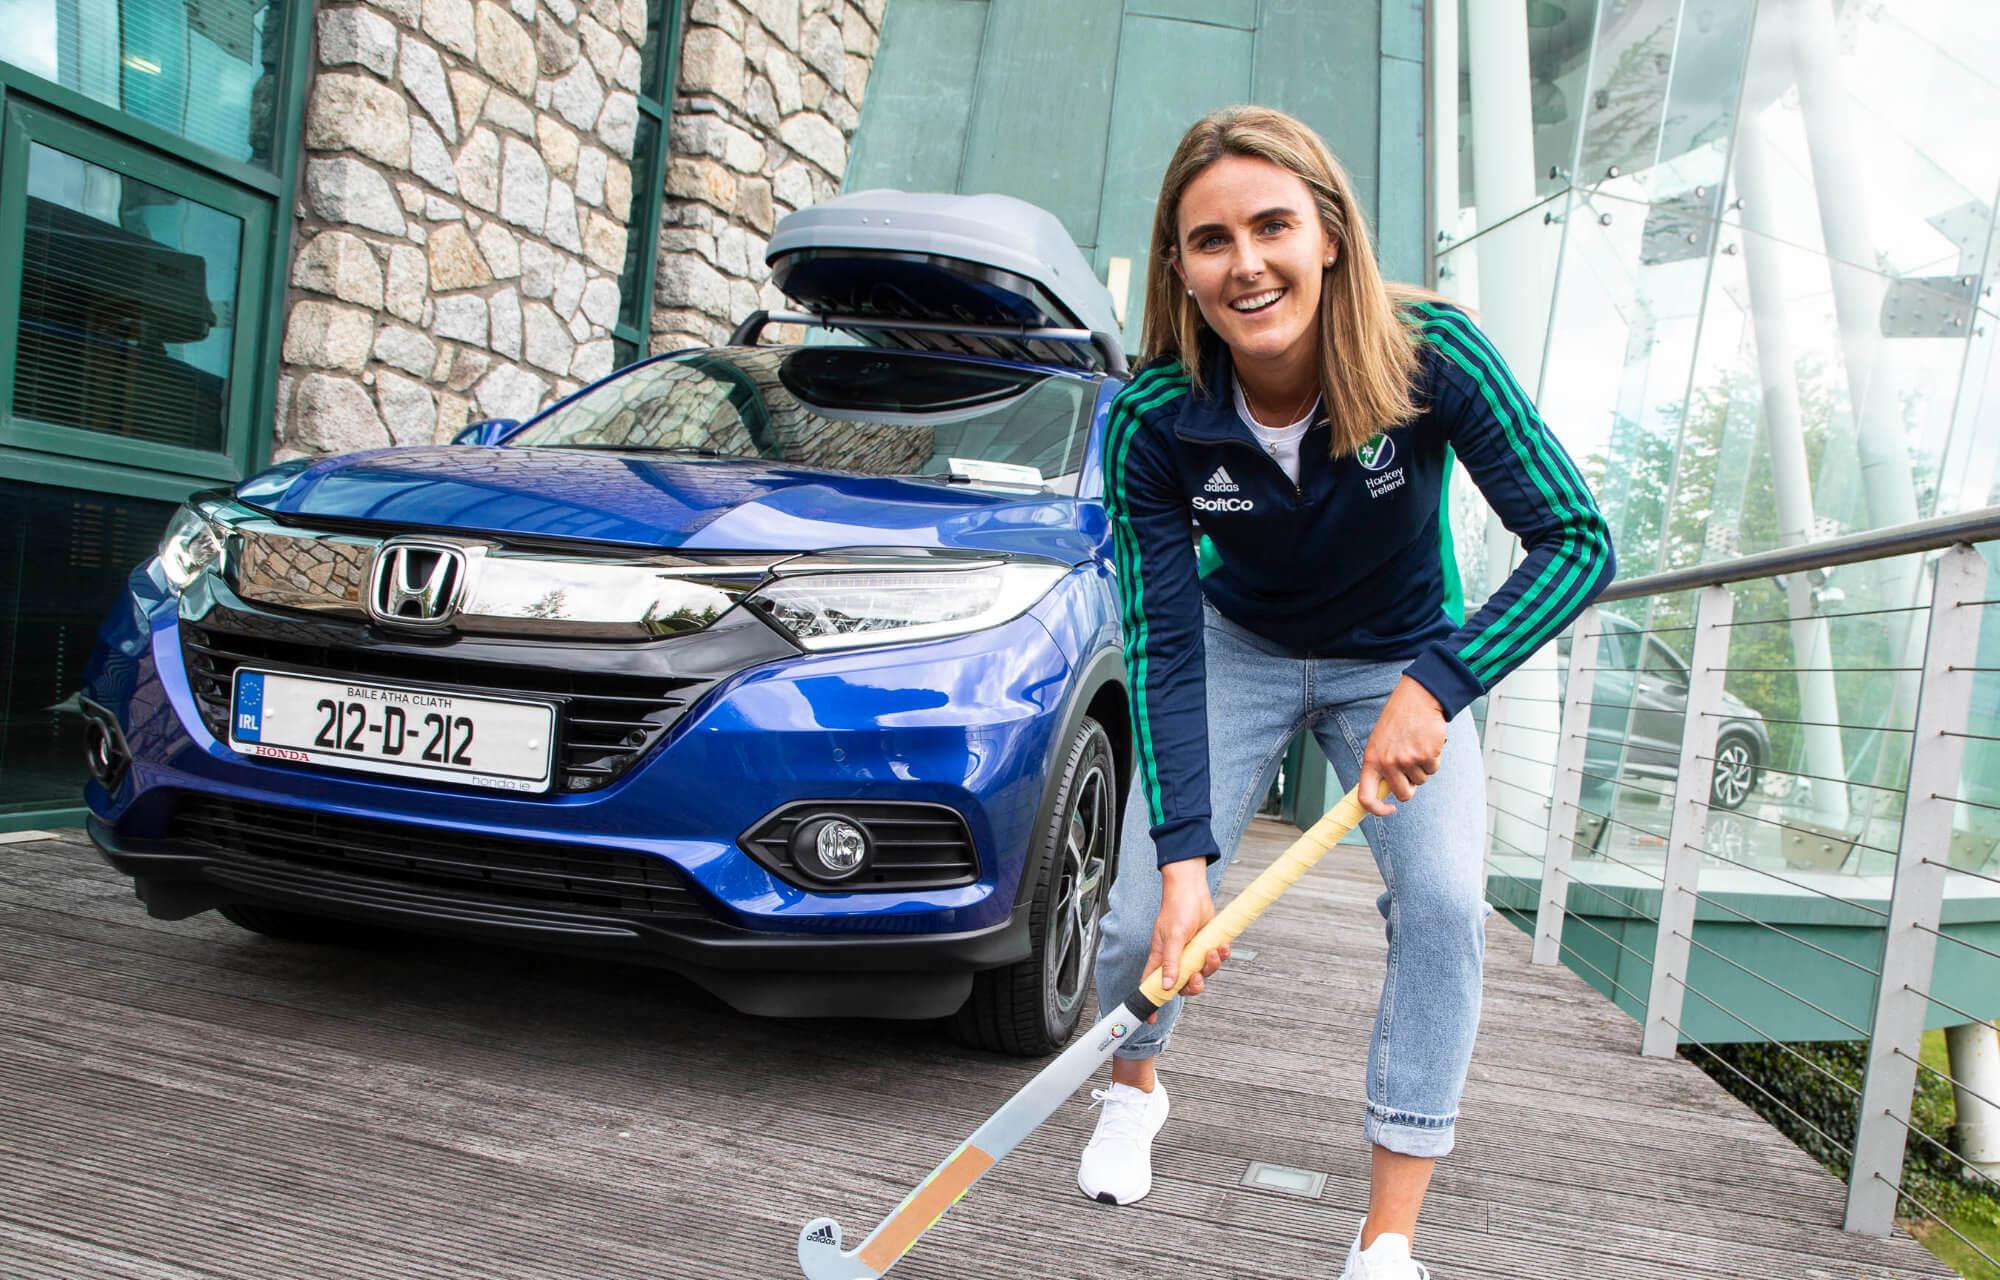 Brand Ambassadors Katie Taylor and Nikki Evans help launch Honda's new 212 HR-V offer